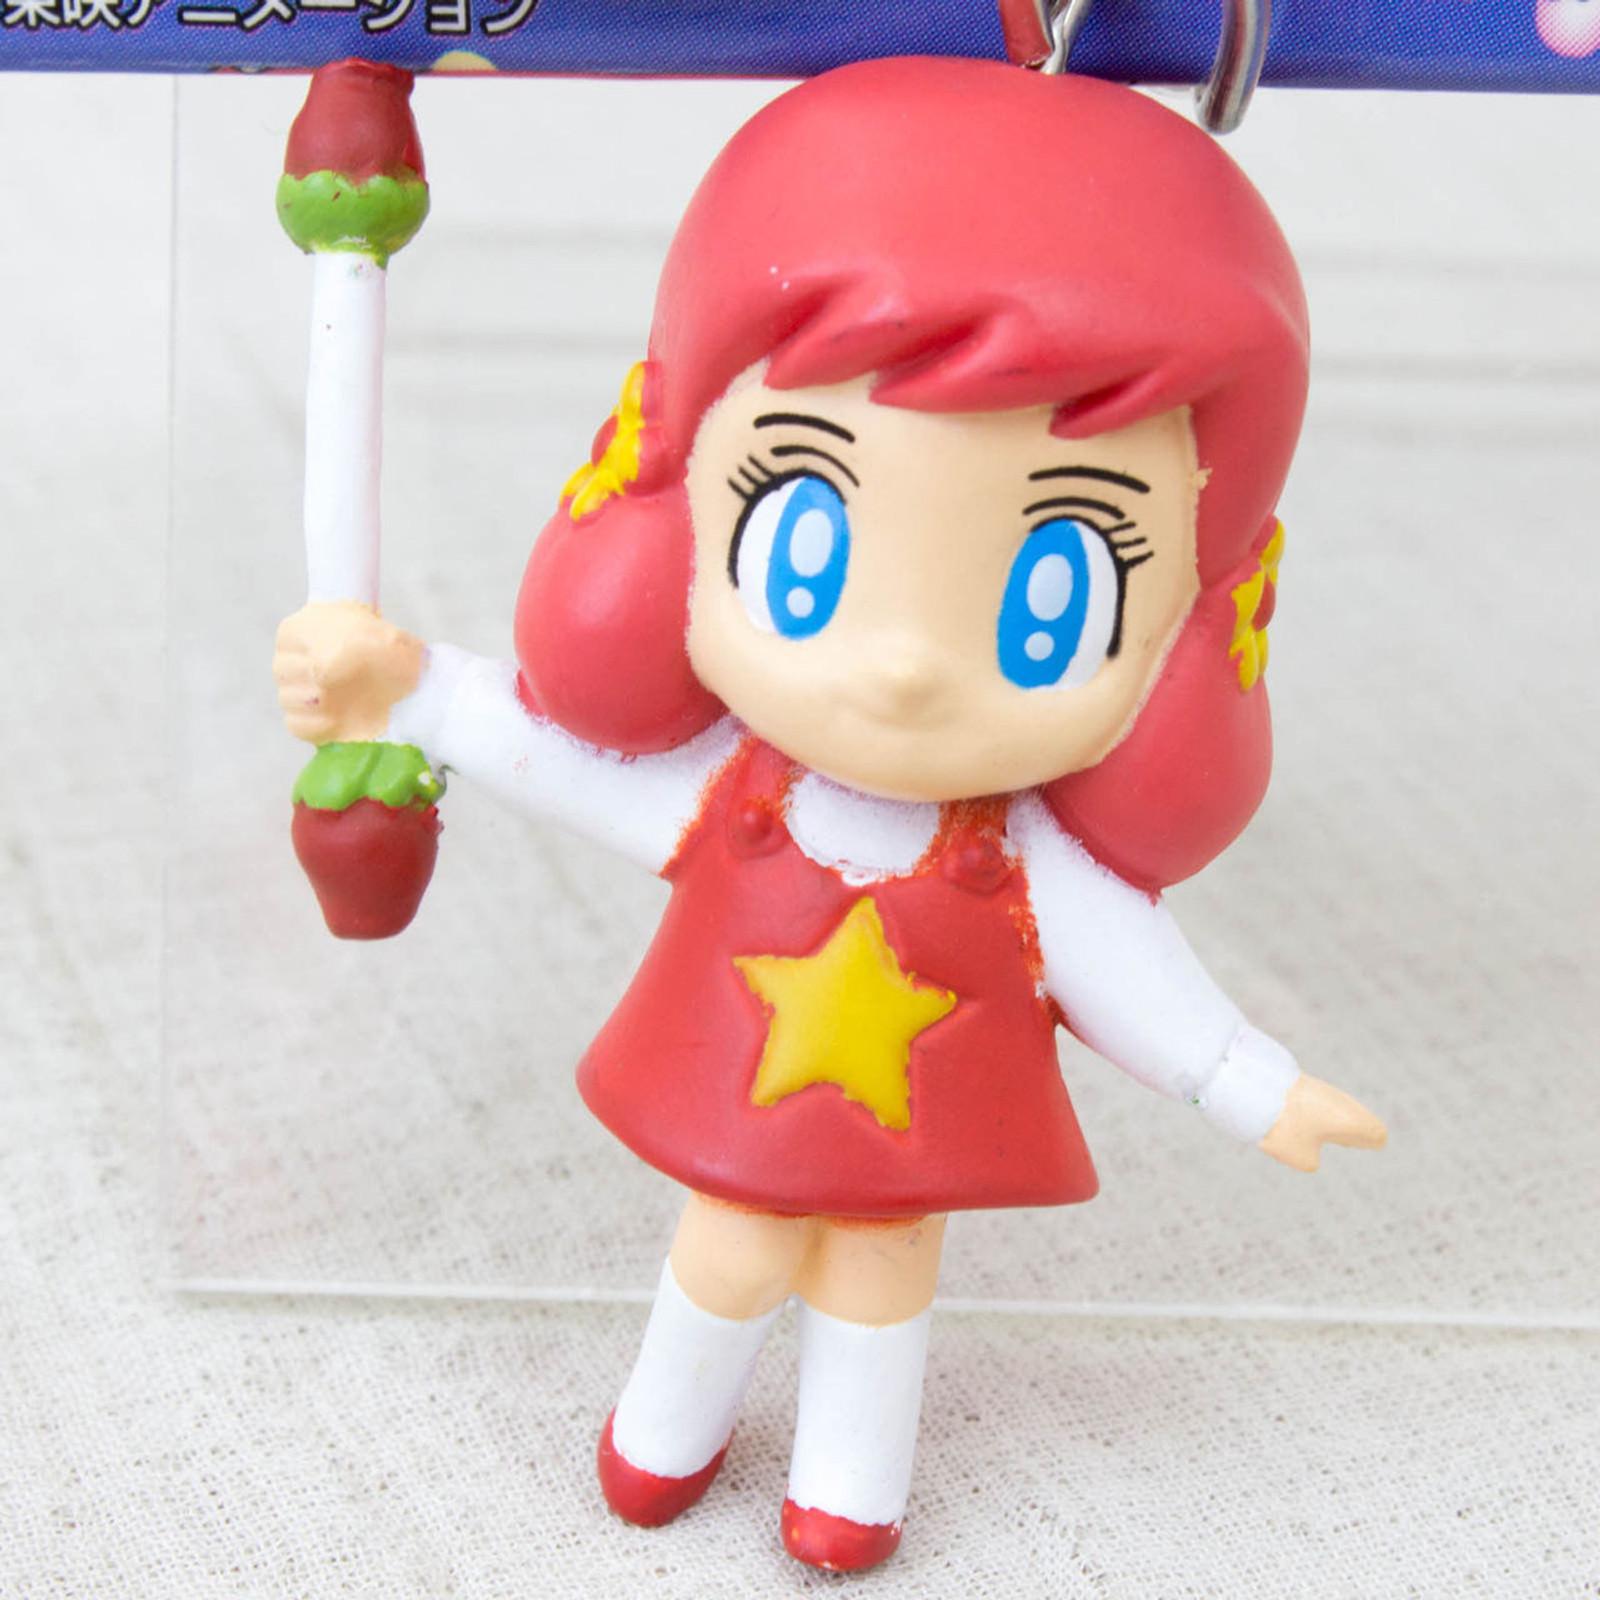 Chappy the Witch Mascot Figure Key Chain JAPAN ANIME MANGA Majokko Maho Tsukai